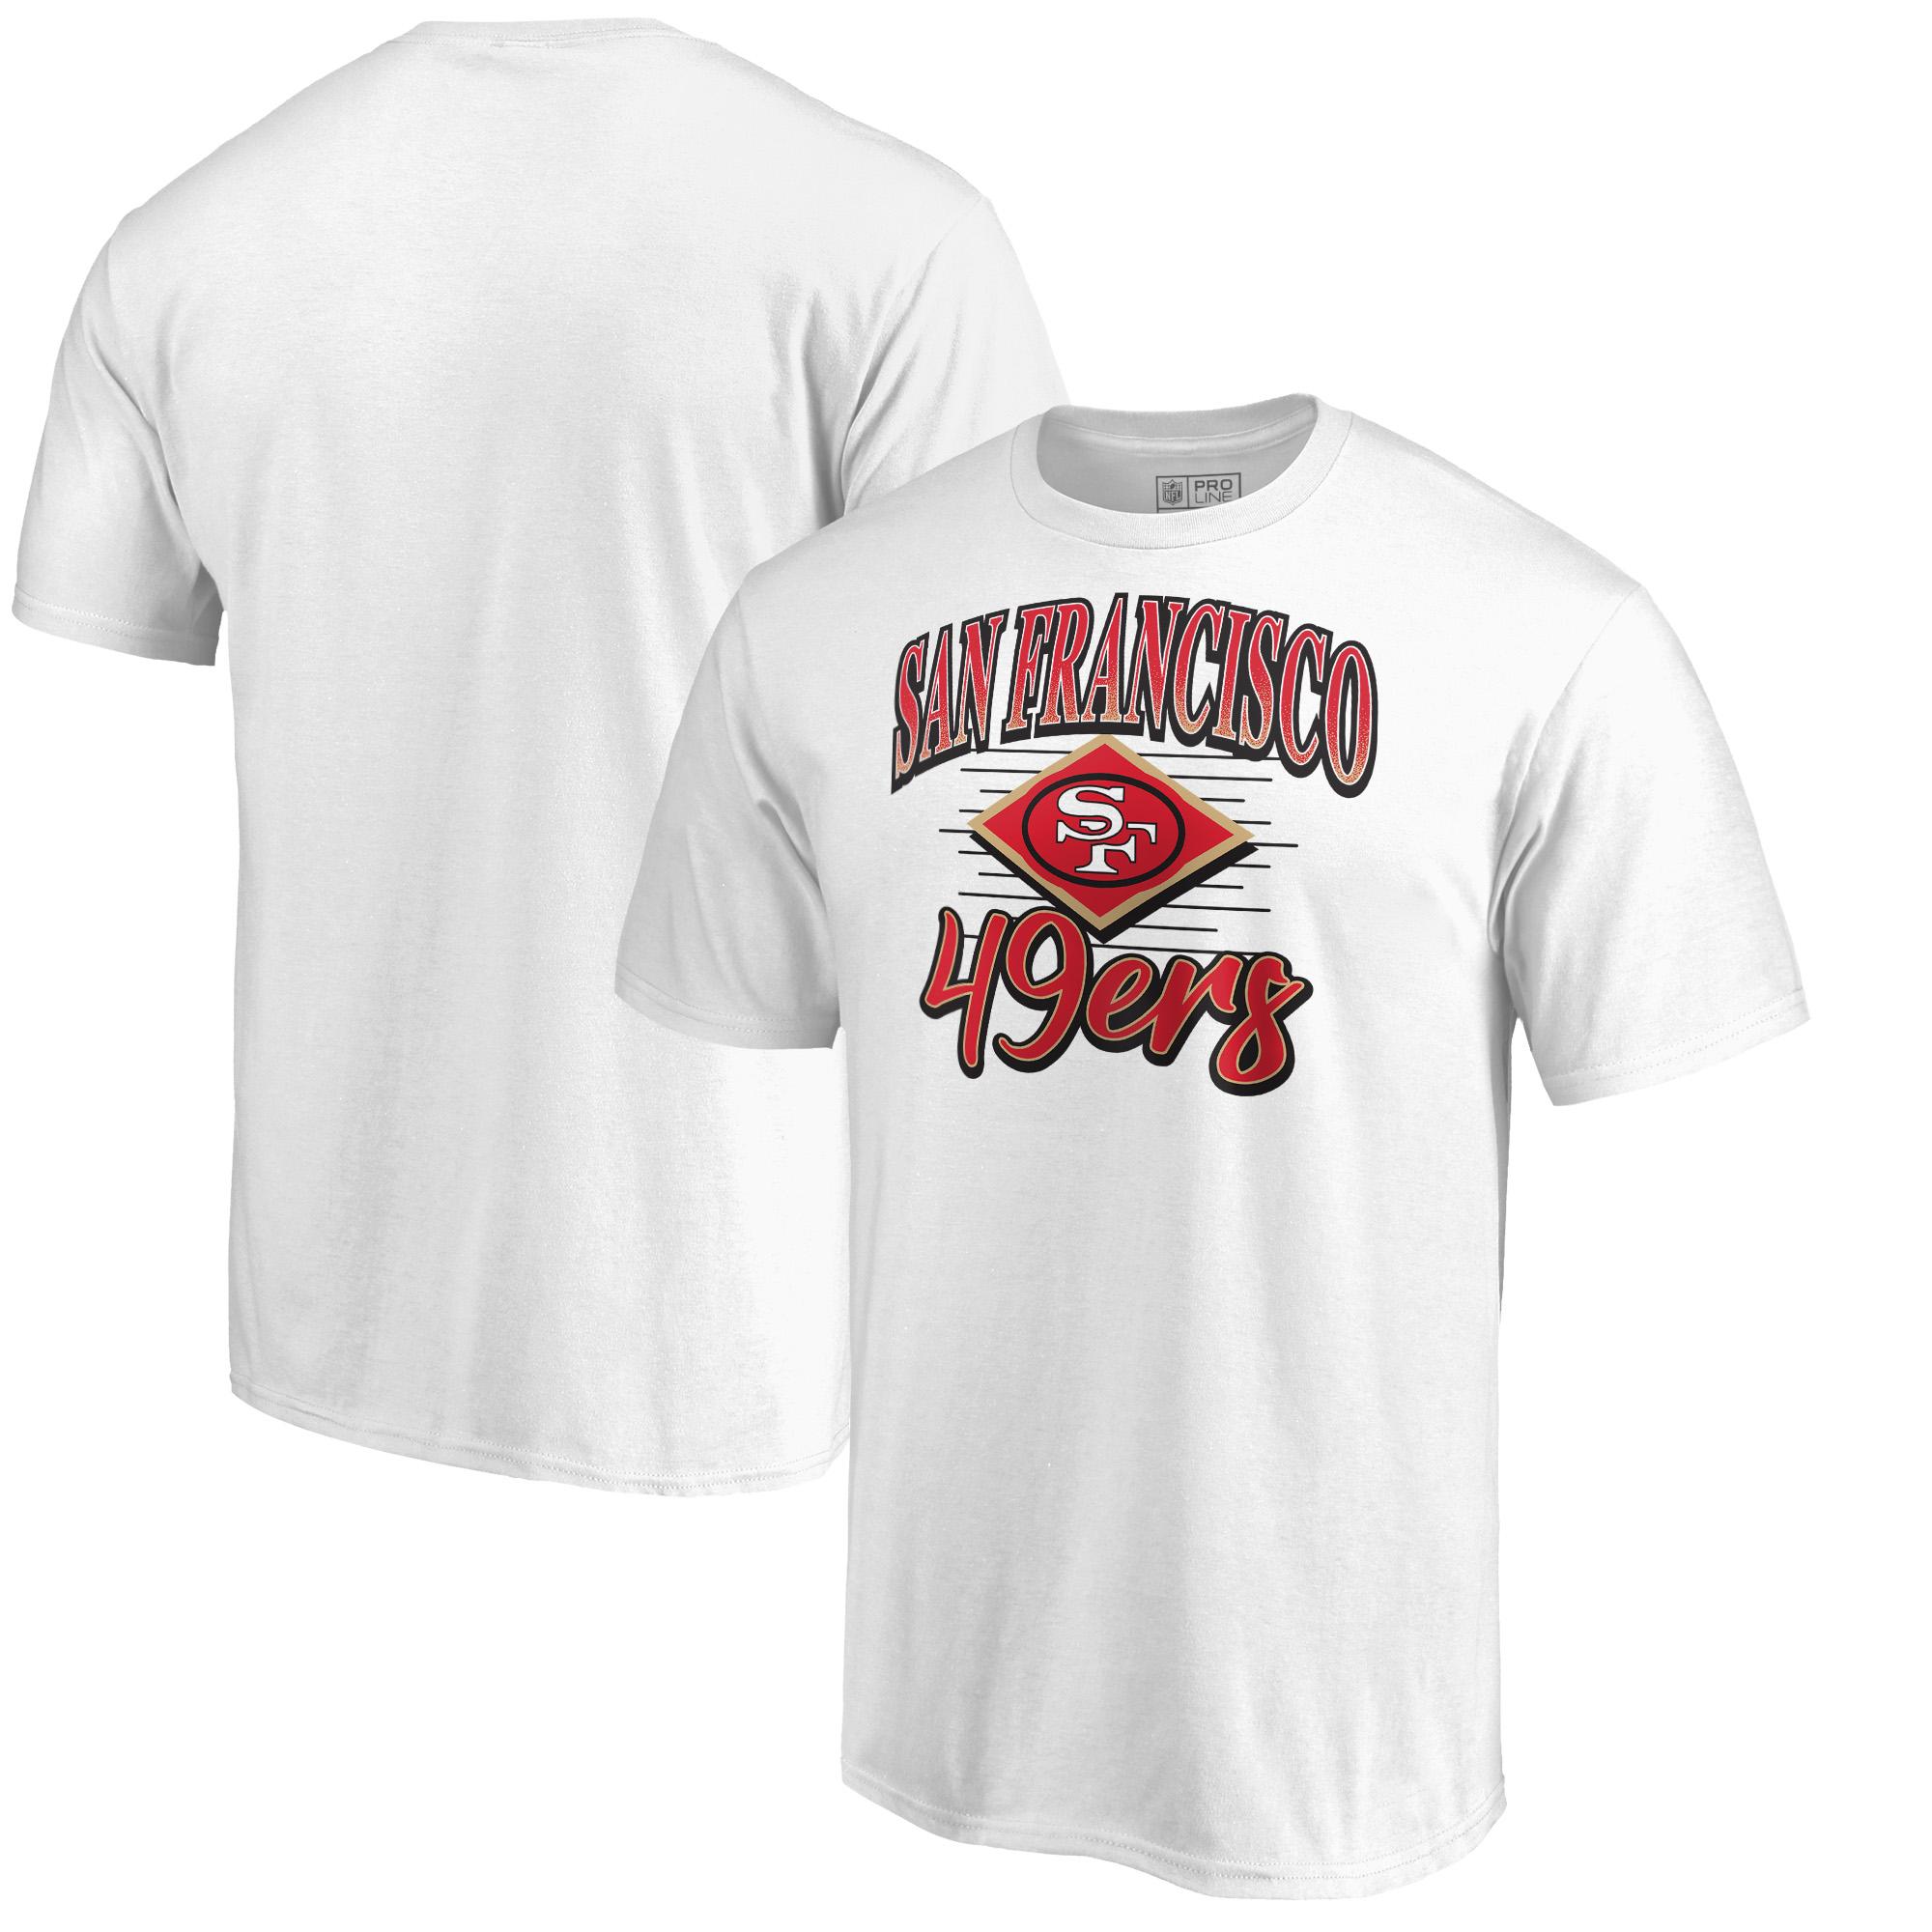 San Francisco 49ers Fanatics Branded Artifact T-Shirt - White